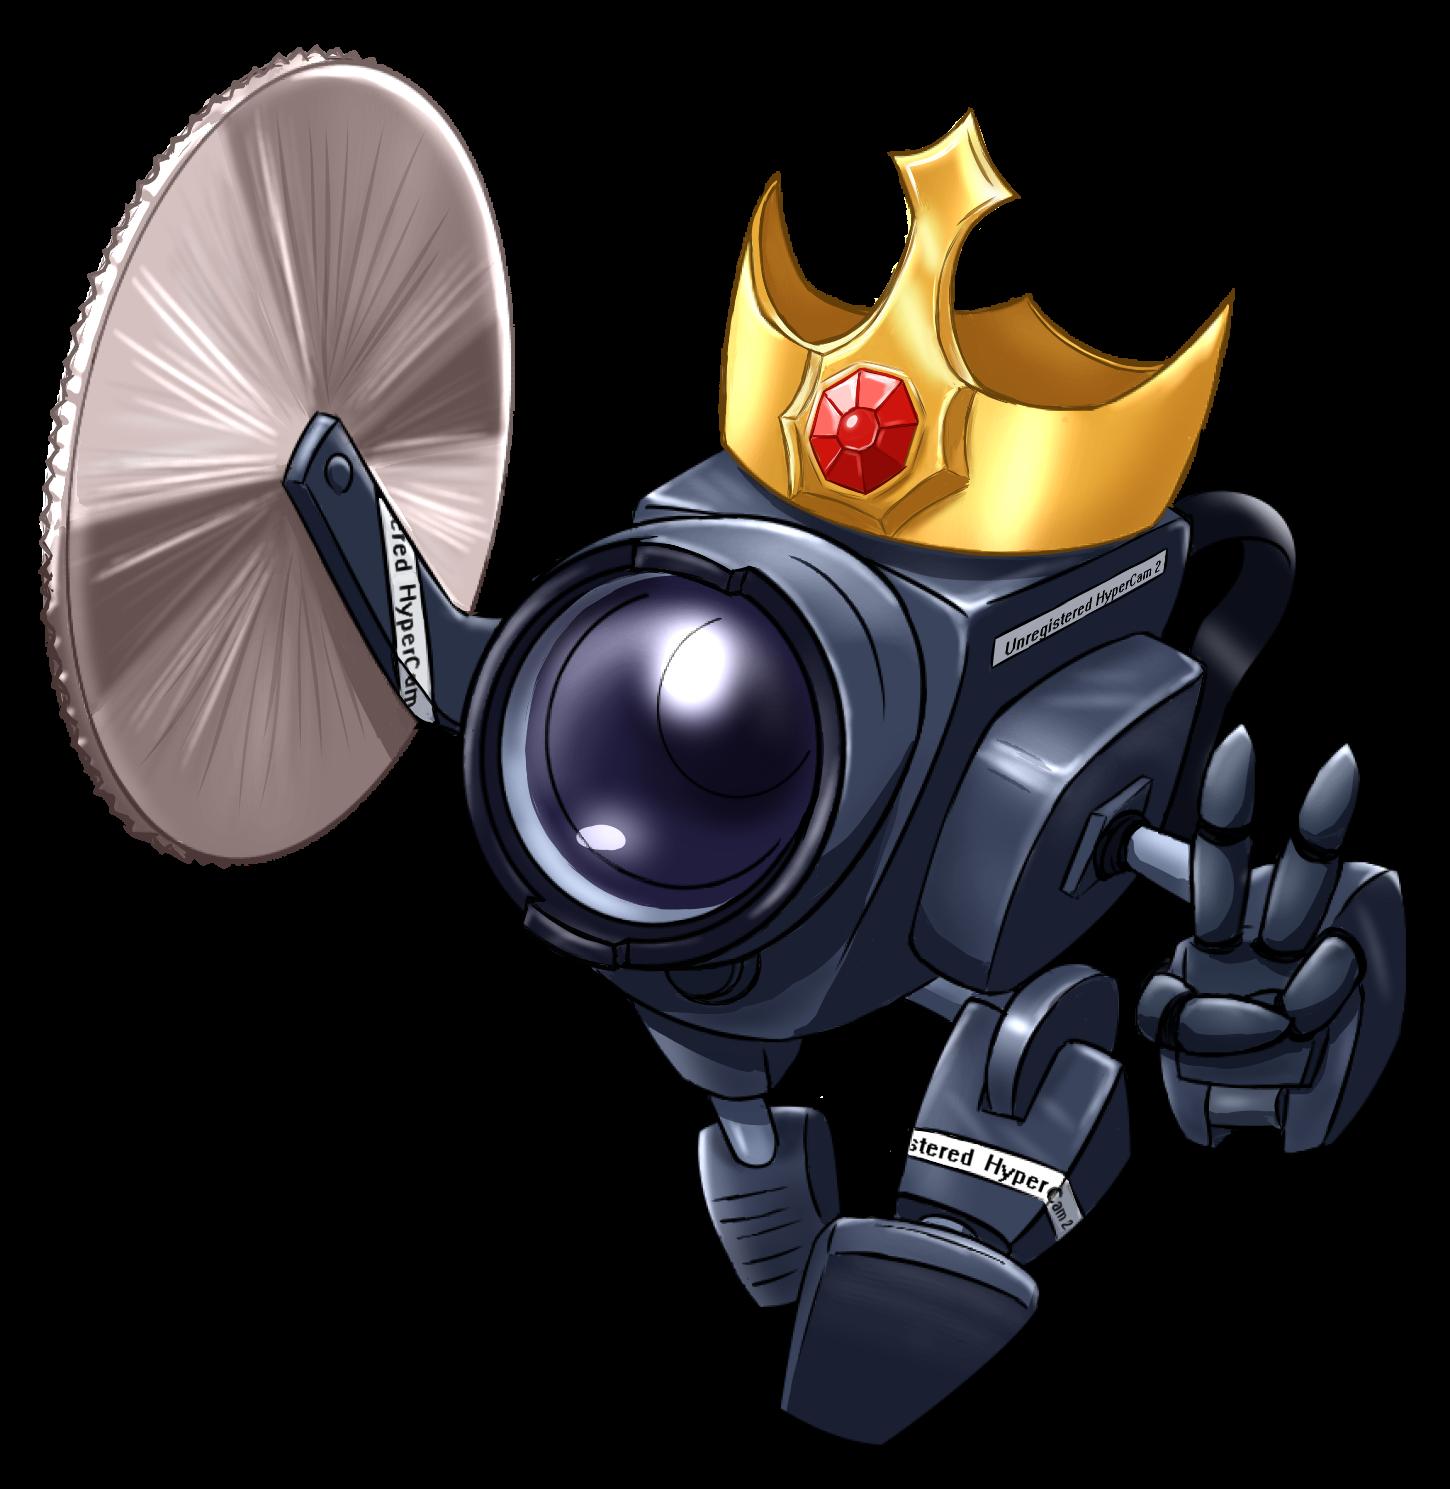 KING HYPERCAM by Secksy-sensei on DeviantArt